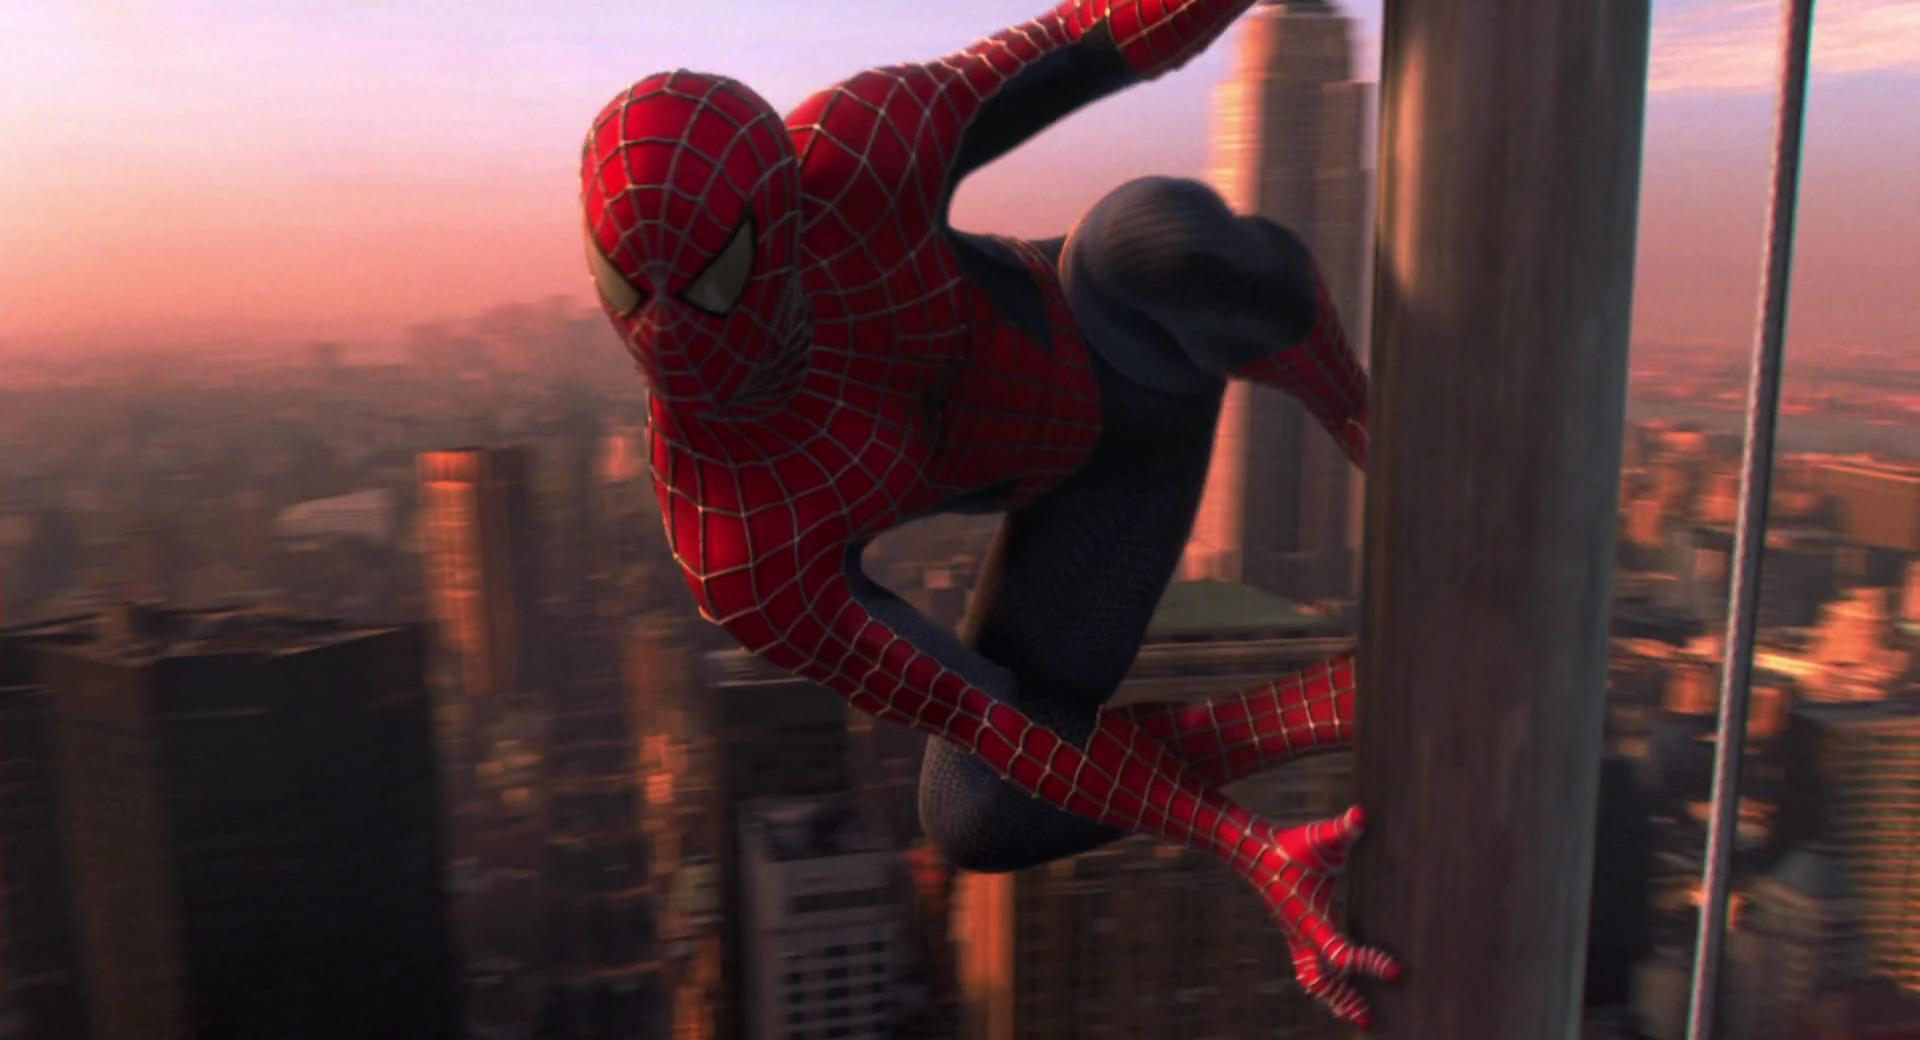 �spiderman� directors� radical redesigns for each reboot